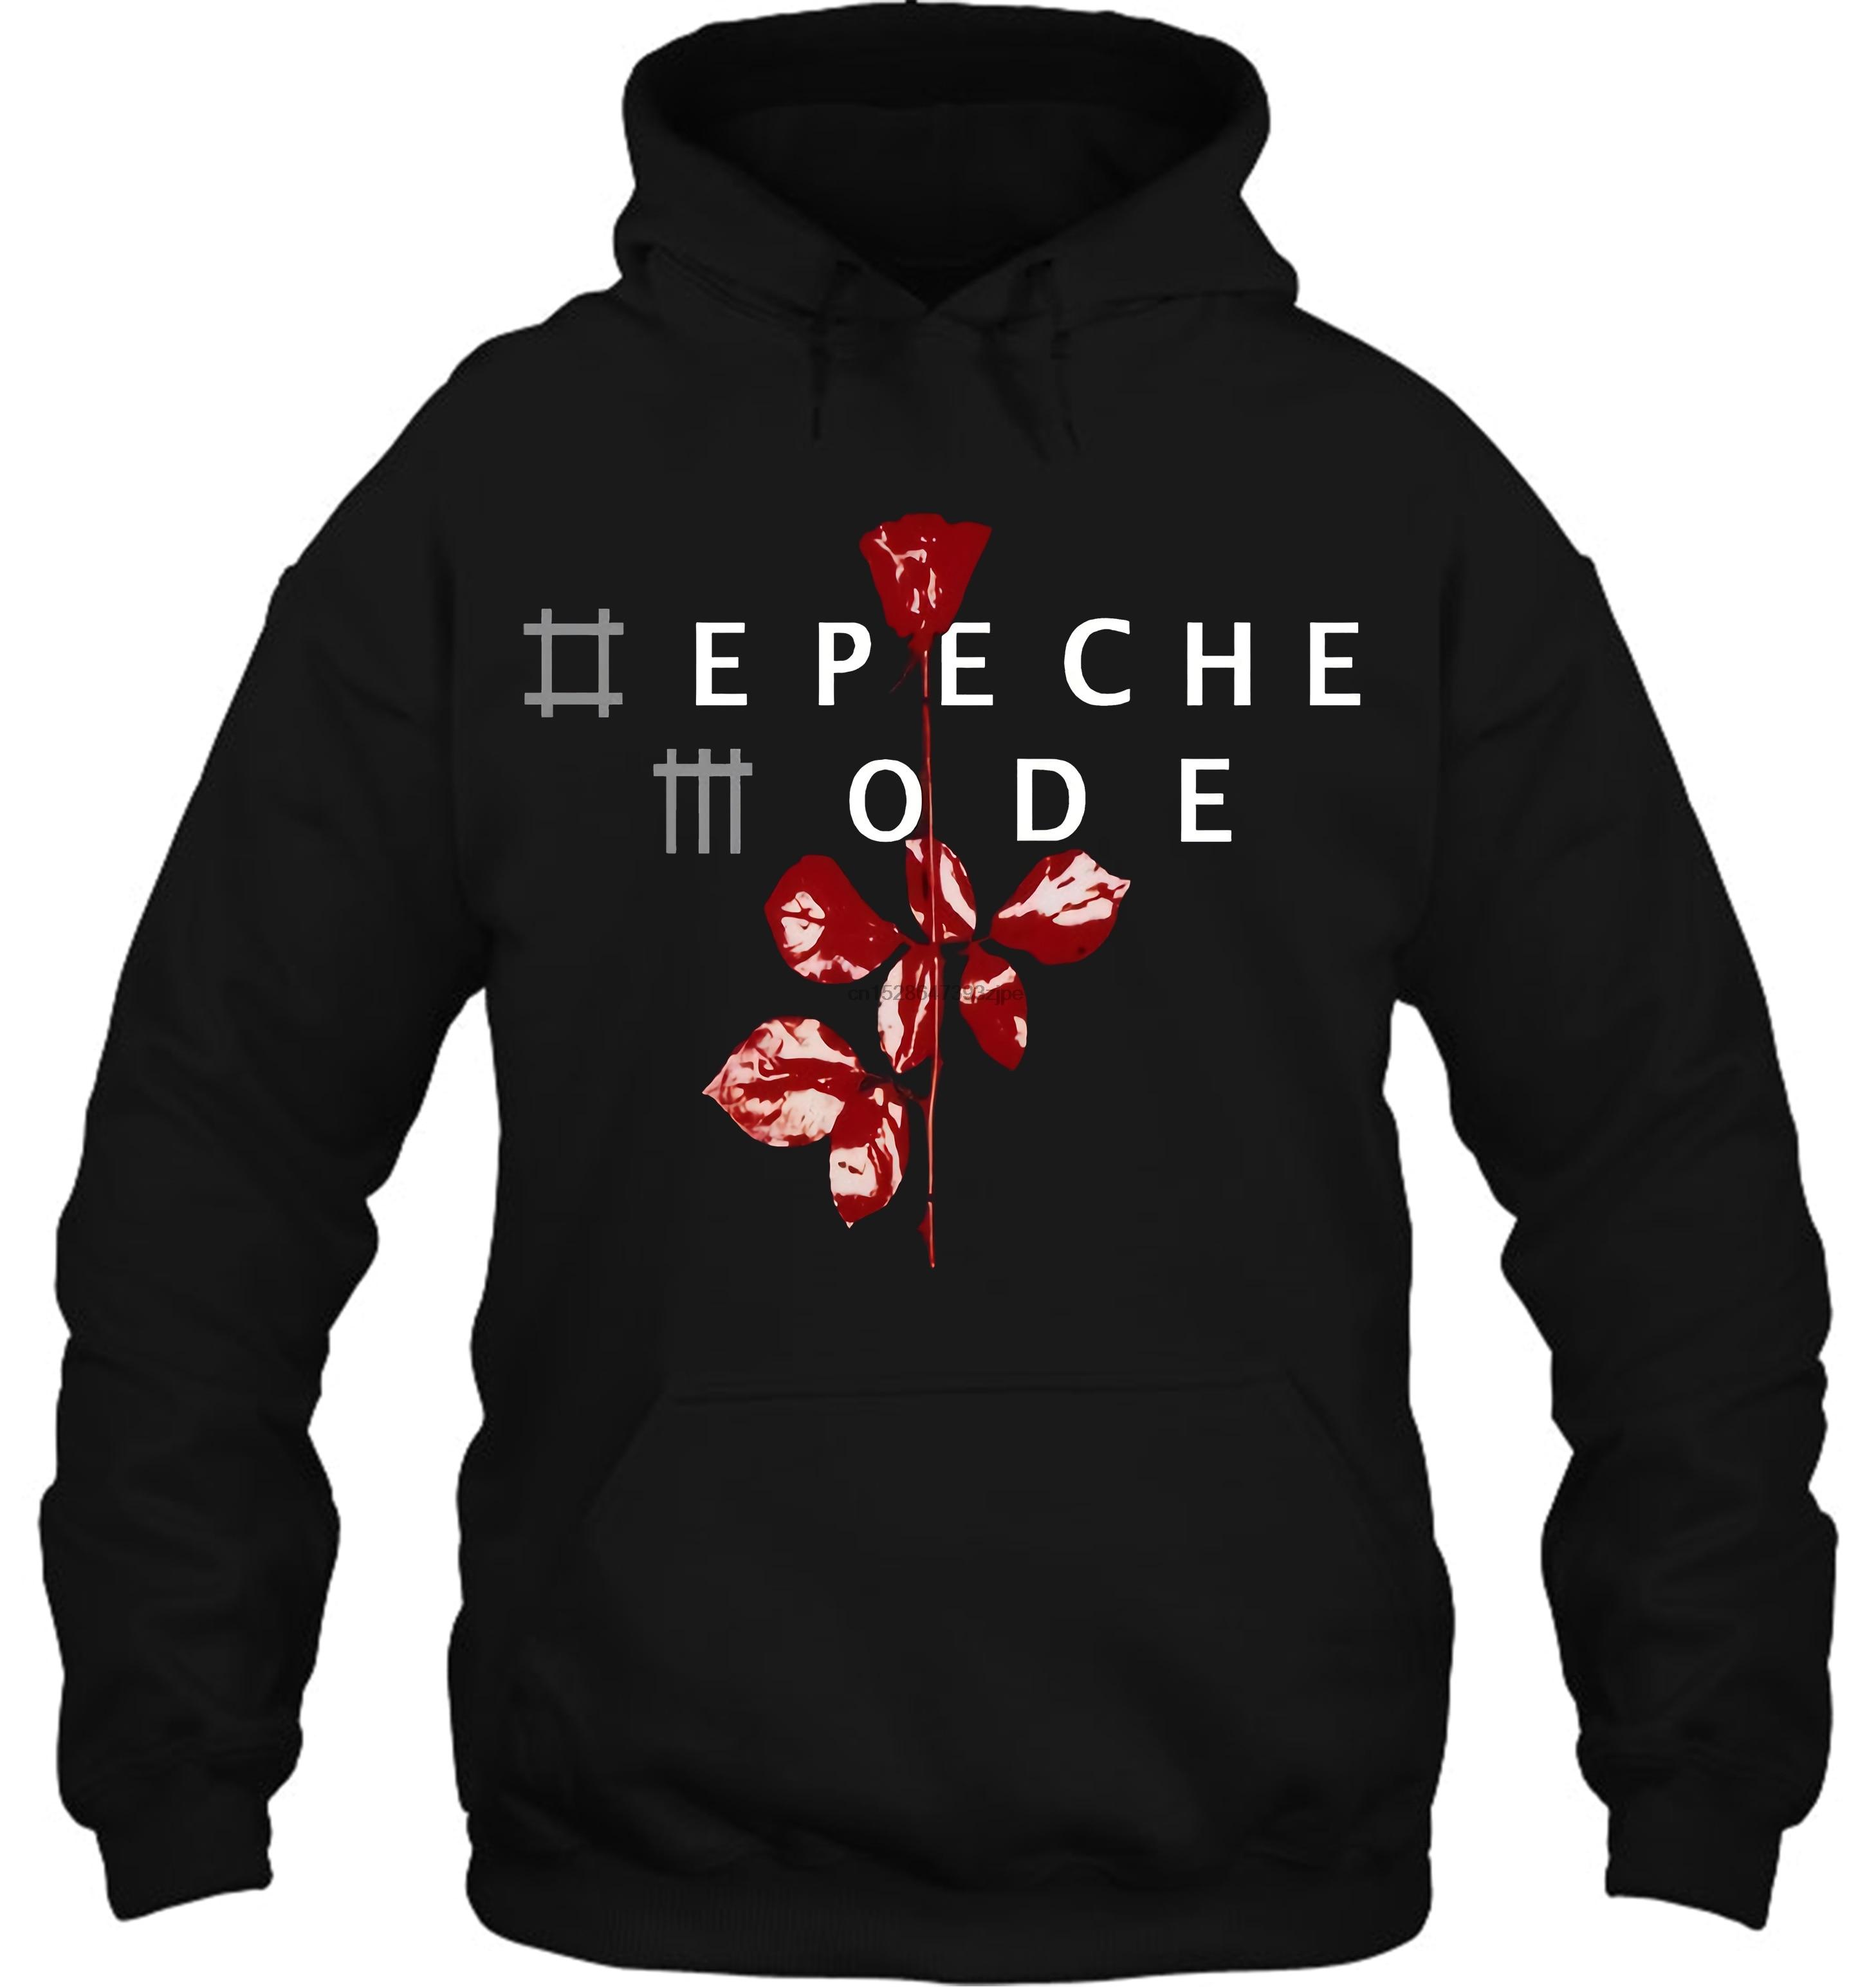 Print Boy Depech Mode Fashionabale Cool Tee Popular Nice Plus Size Streetwear Men Women Hoodies Sweatshirts